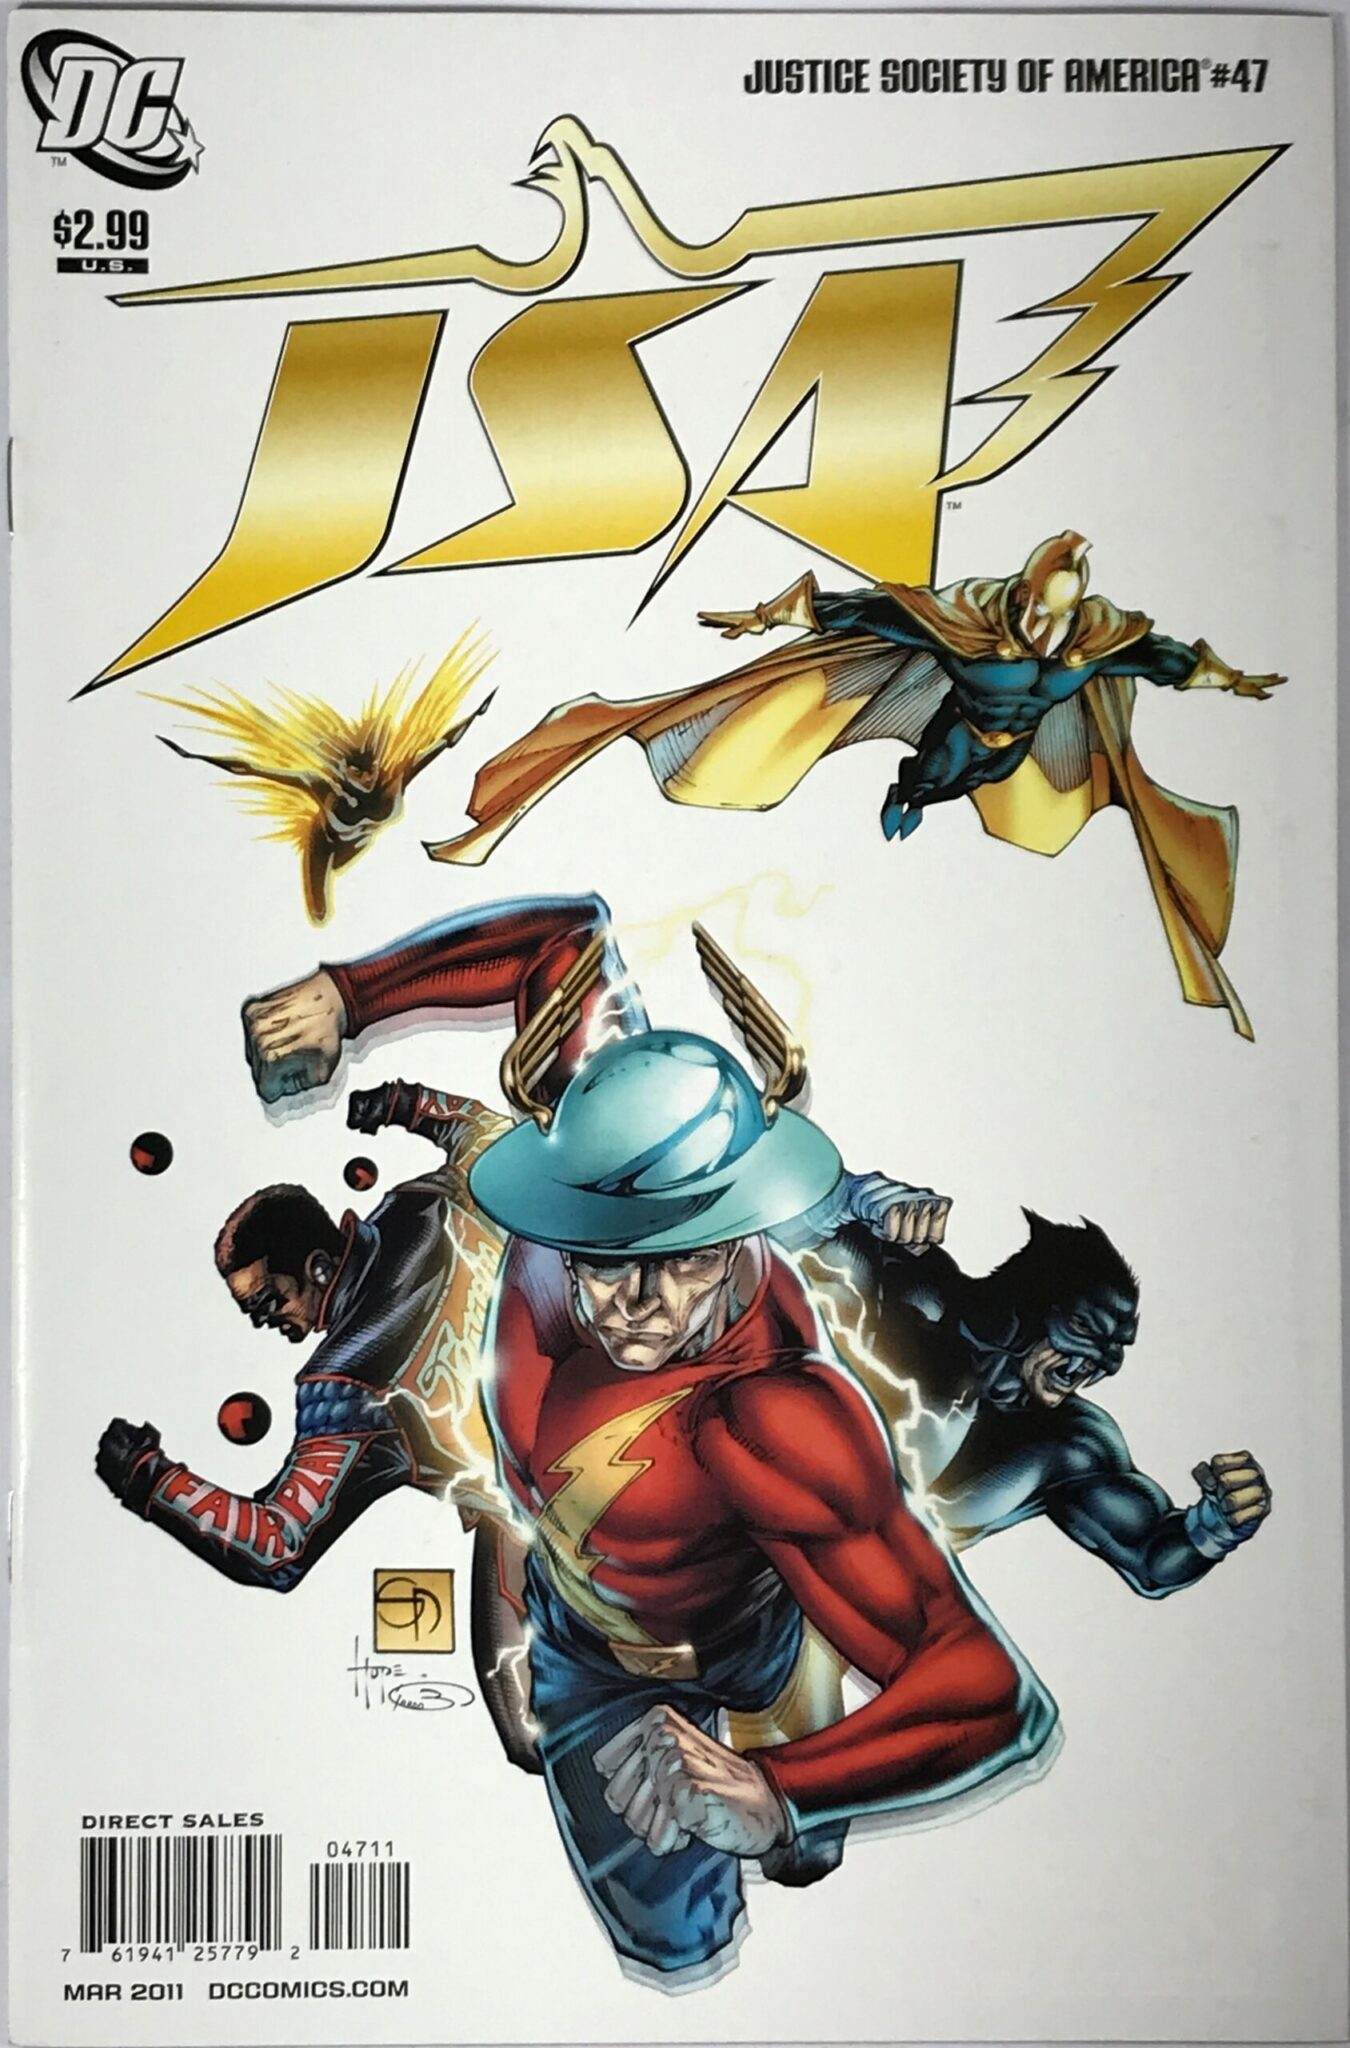 Justice Society of America Vol. 3 (2007-2011) #47 - Very Fine